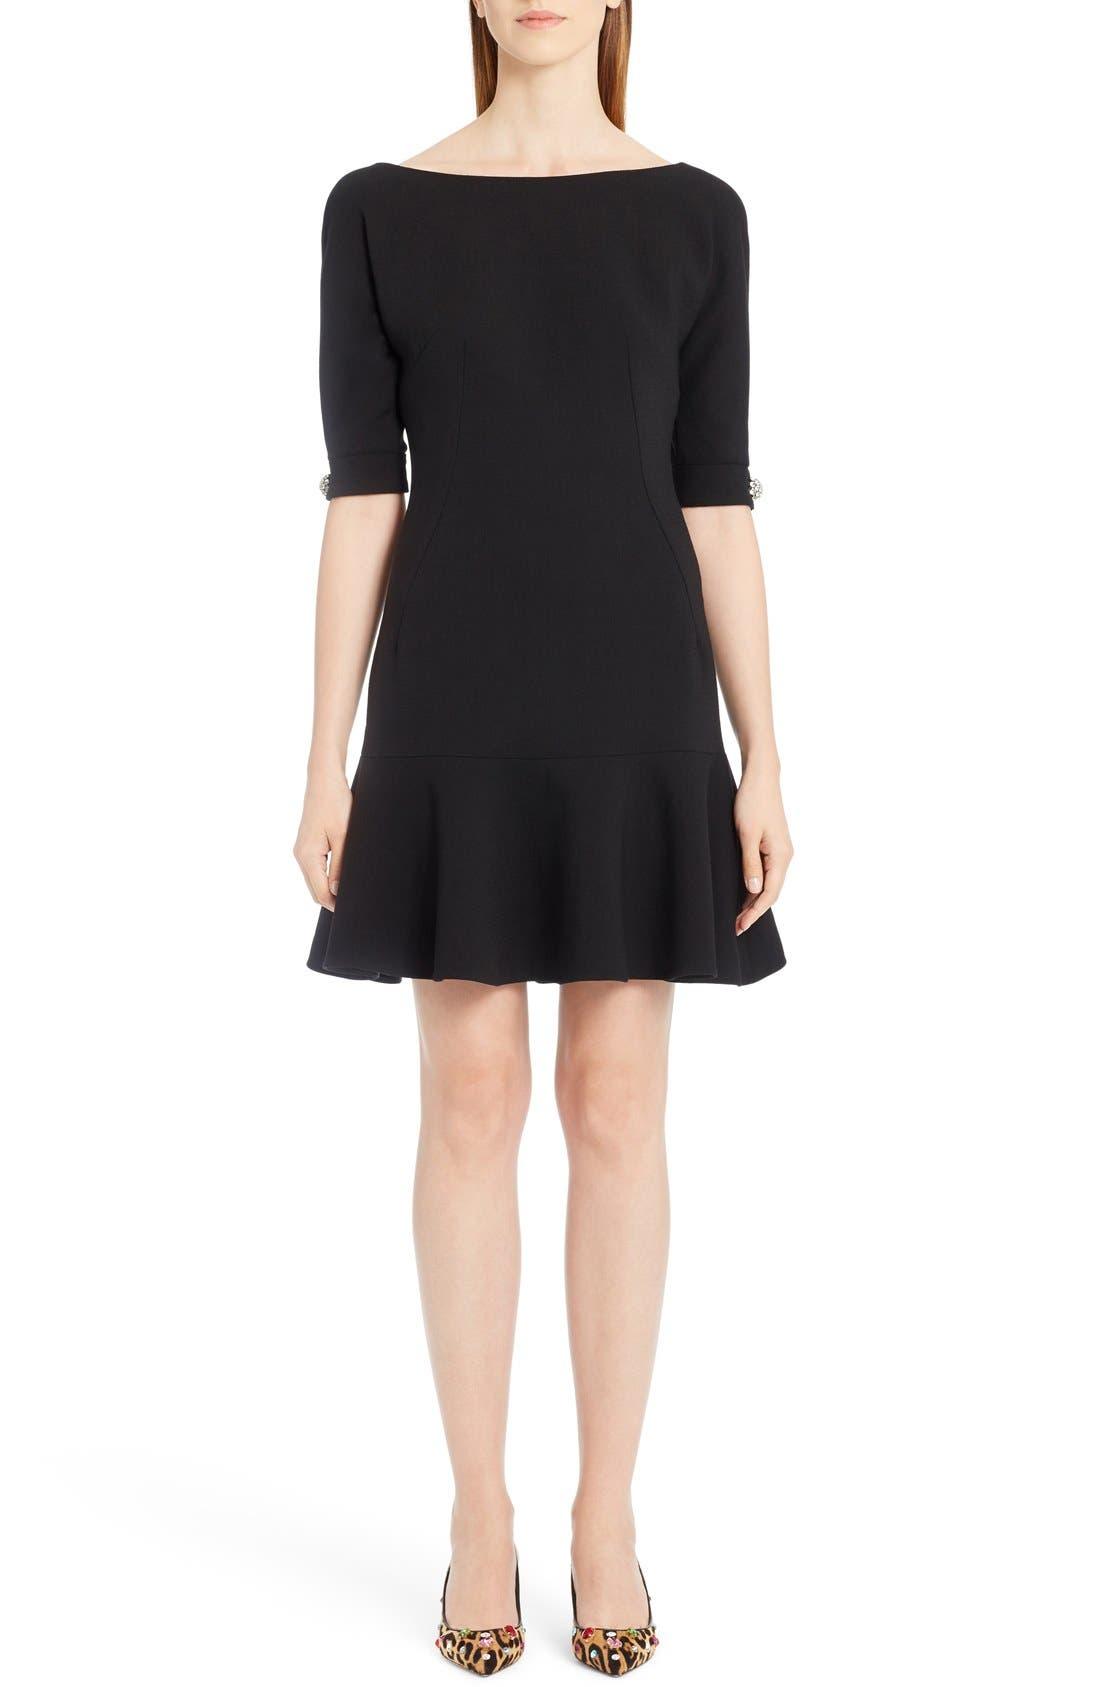 Dolce&Gabbana Stretch Wool Fit & Flare Dress